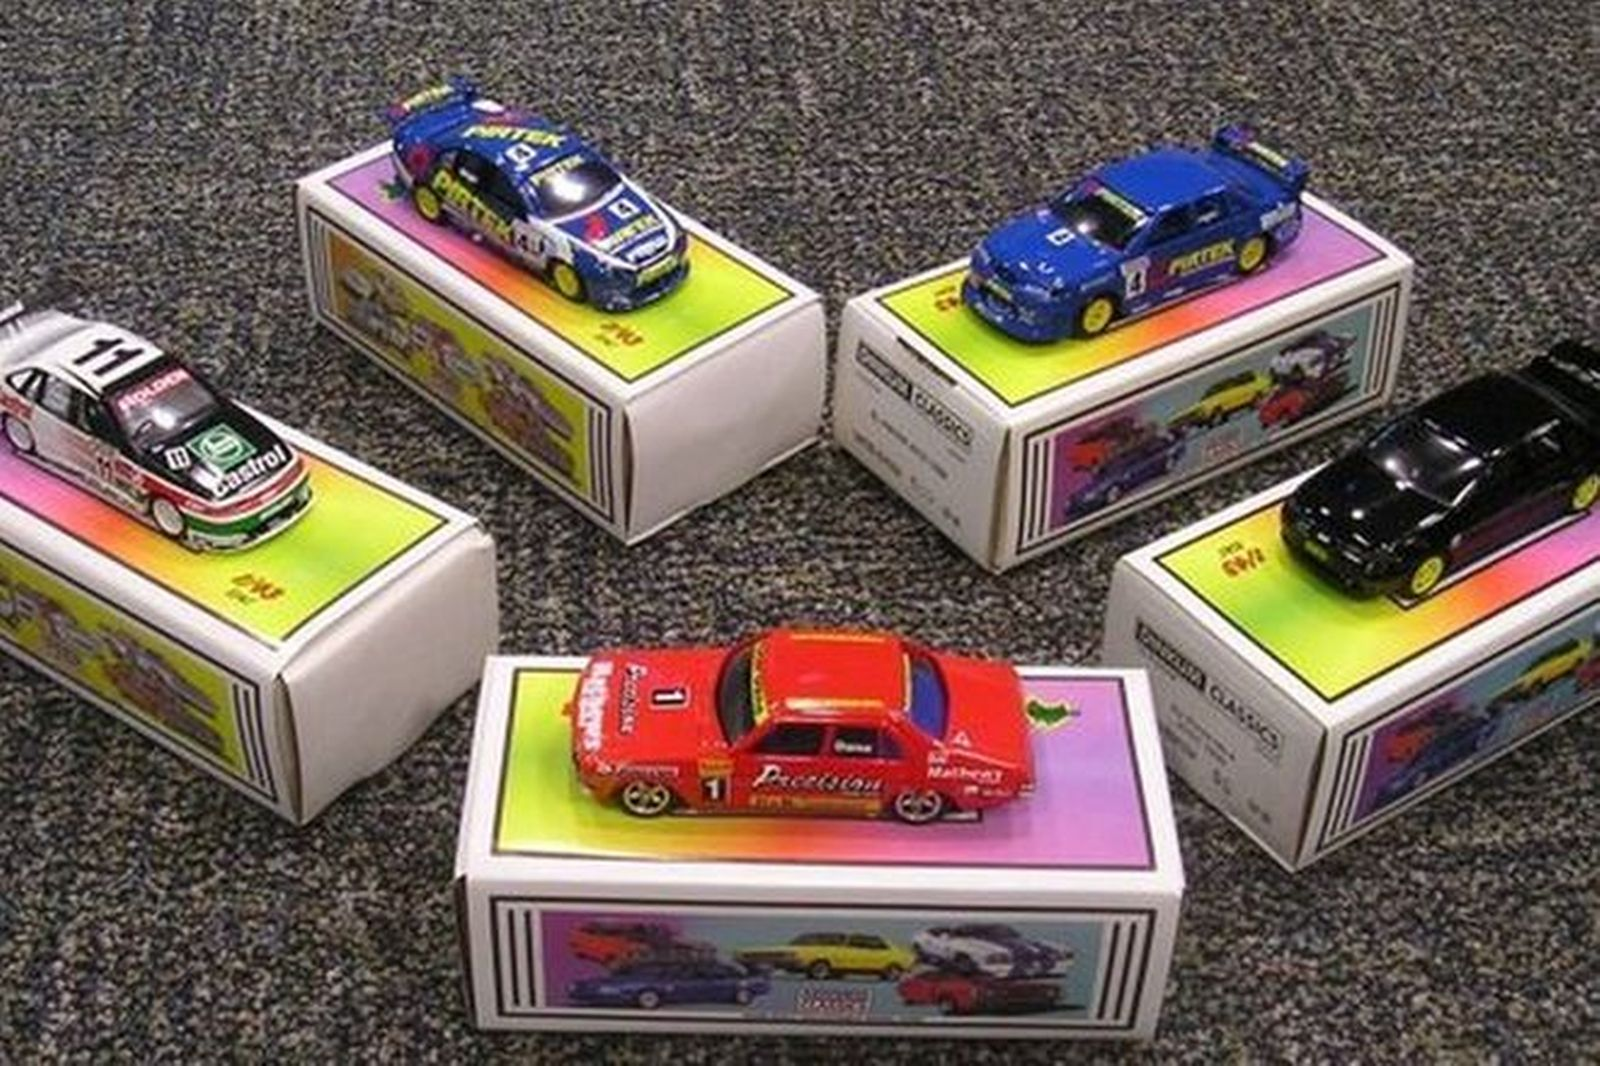 Model Cars - 4 x Dinkum Classics  - 'Richards' Mustang, 'Brown's' XYGT, 'Perkins' VC, Bright/Richard